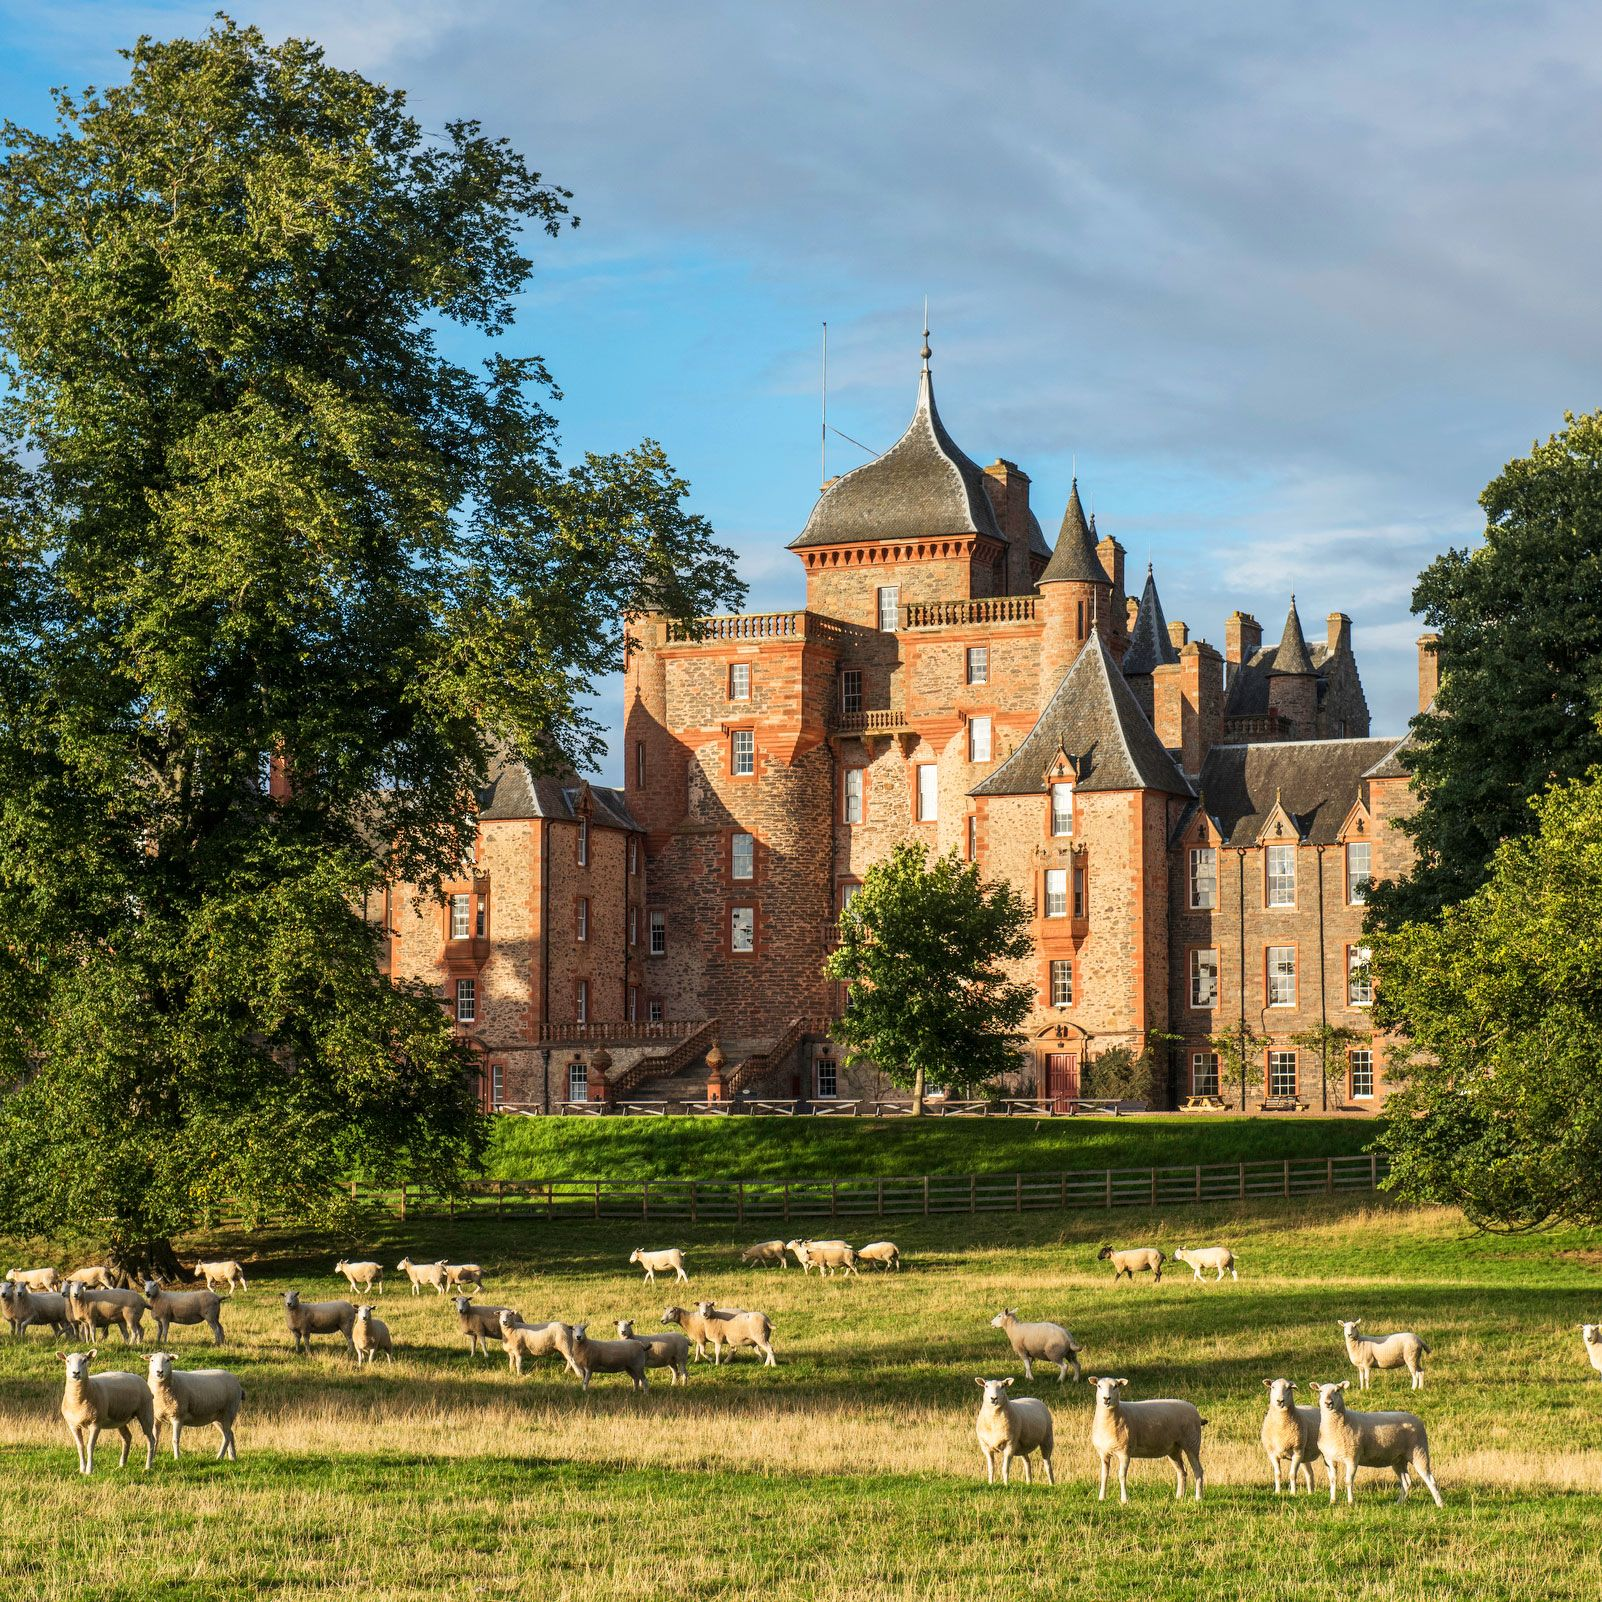 Thirlestane Castle in Berwickshire